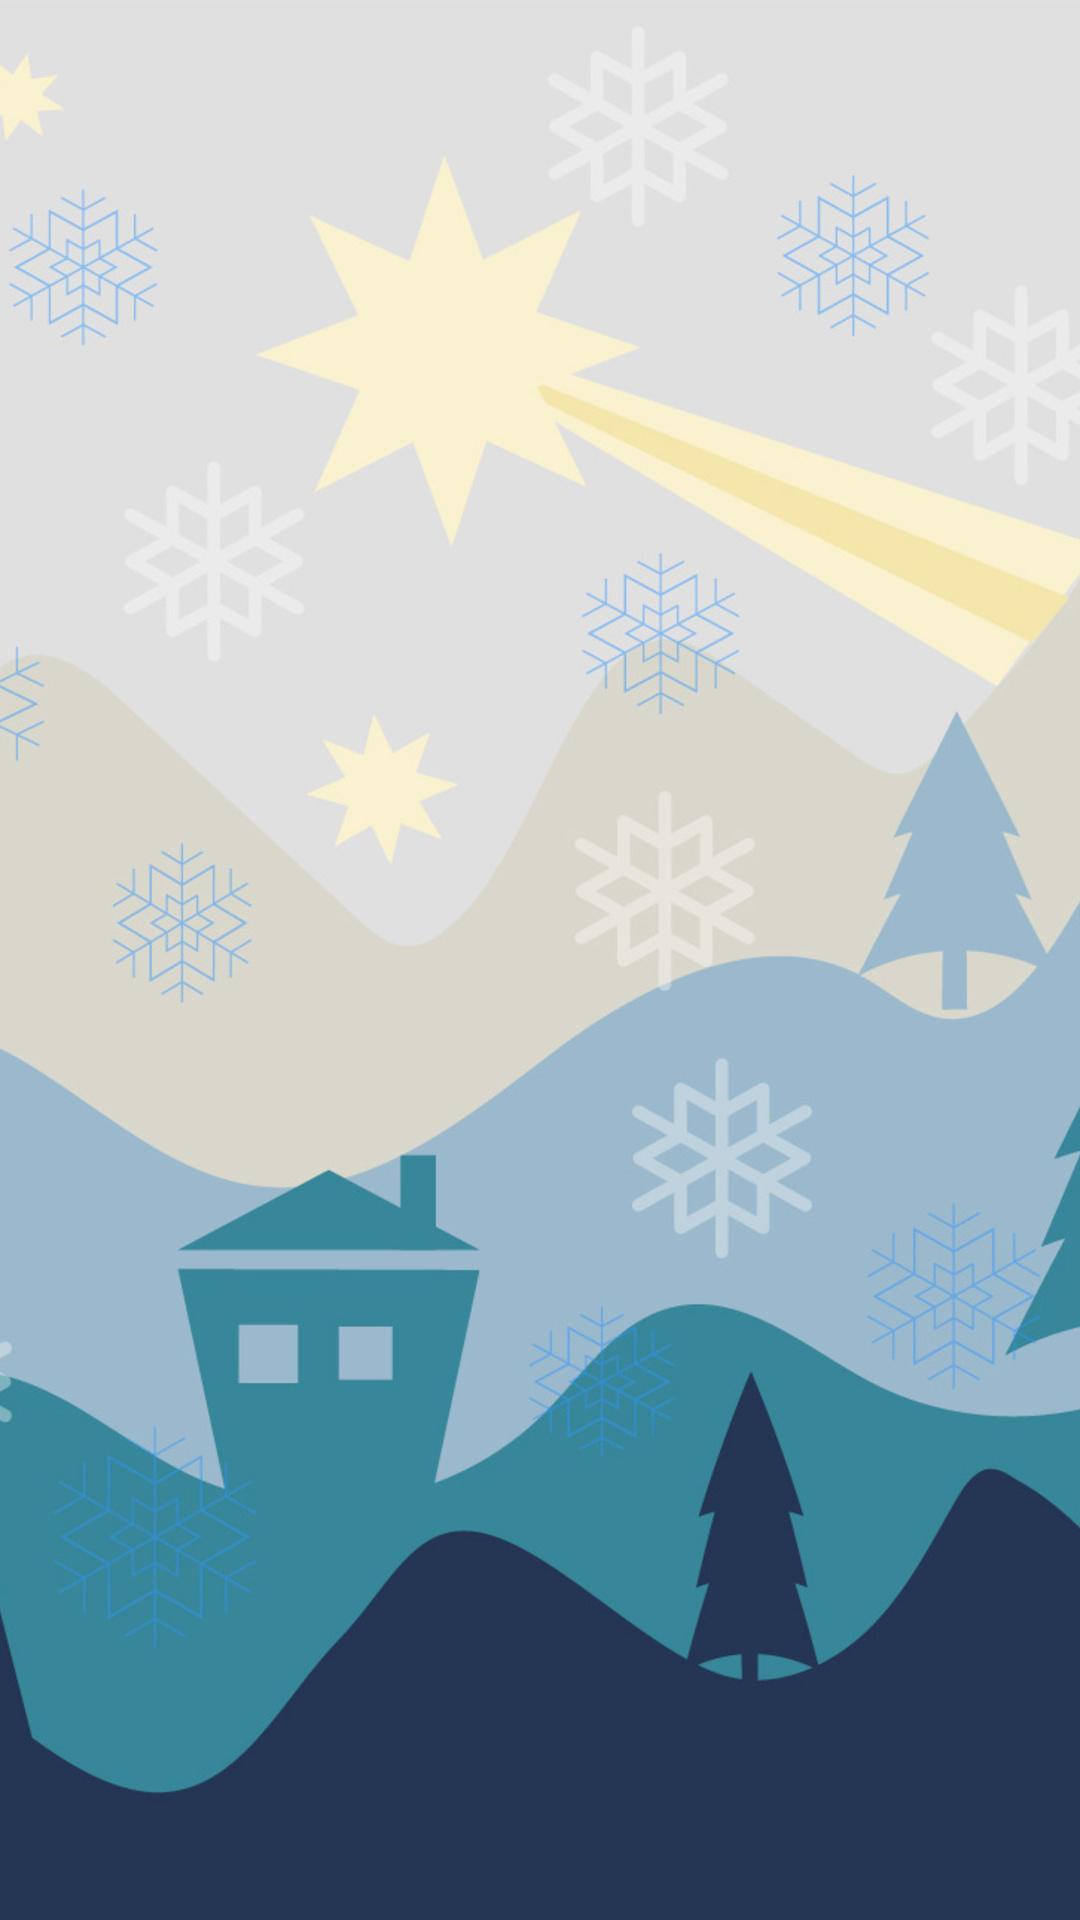 1080x1920 Christmas Flat Design Background Iphone 7,6s,6 Plus, Pixel ...